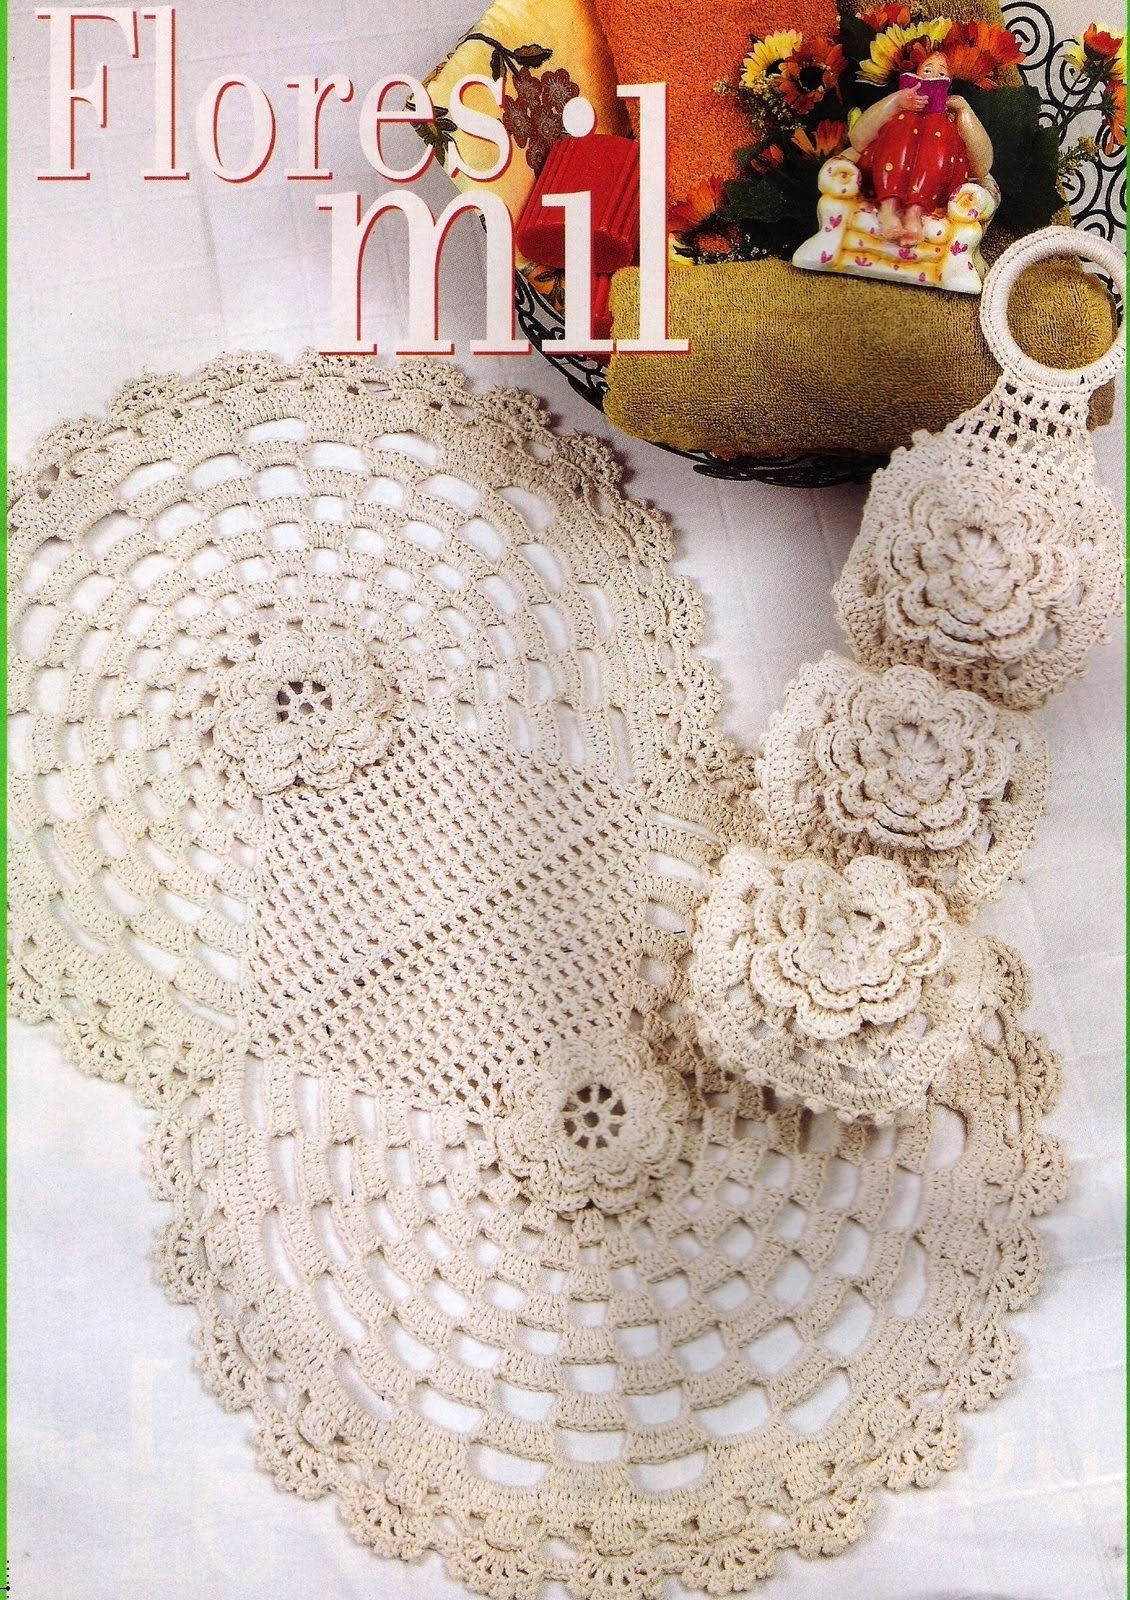 "Juegos De Baño A Crochet: Mi Casa"": Juego de baño blanco con rosa tejido a ganchillo o crochet"